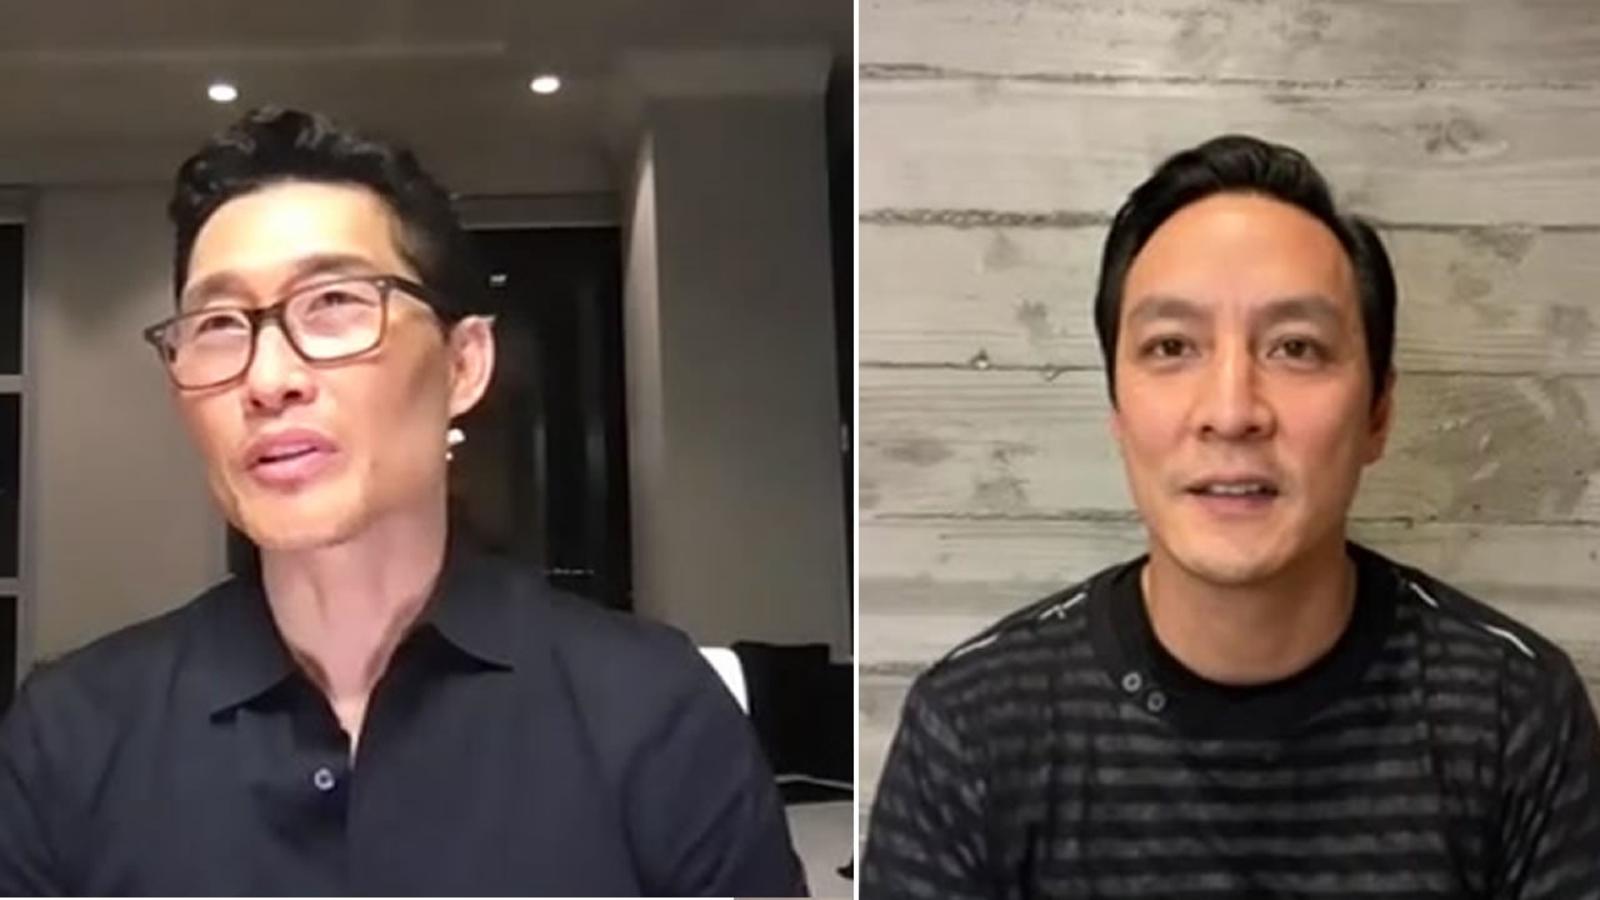 abc7news.com: Actors Daniel Dae Kim, Daniel Wu discuss violent crimes against Asian Americans in Bay Area